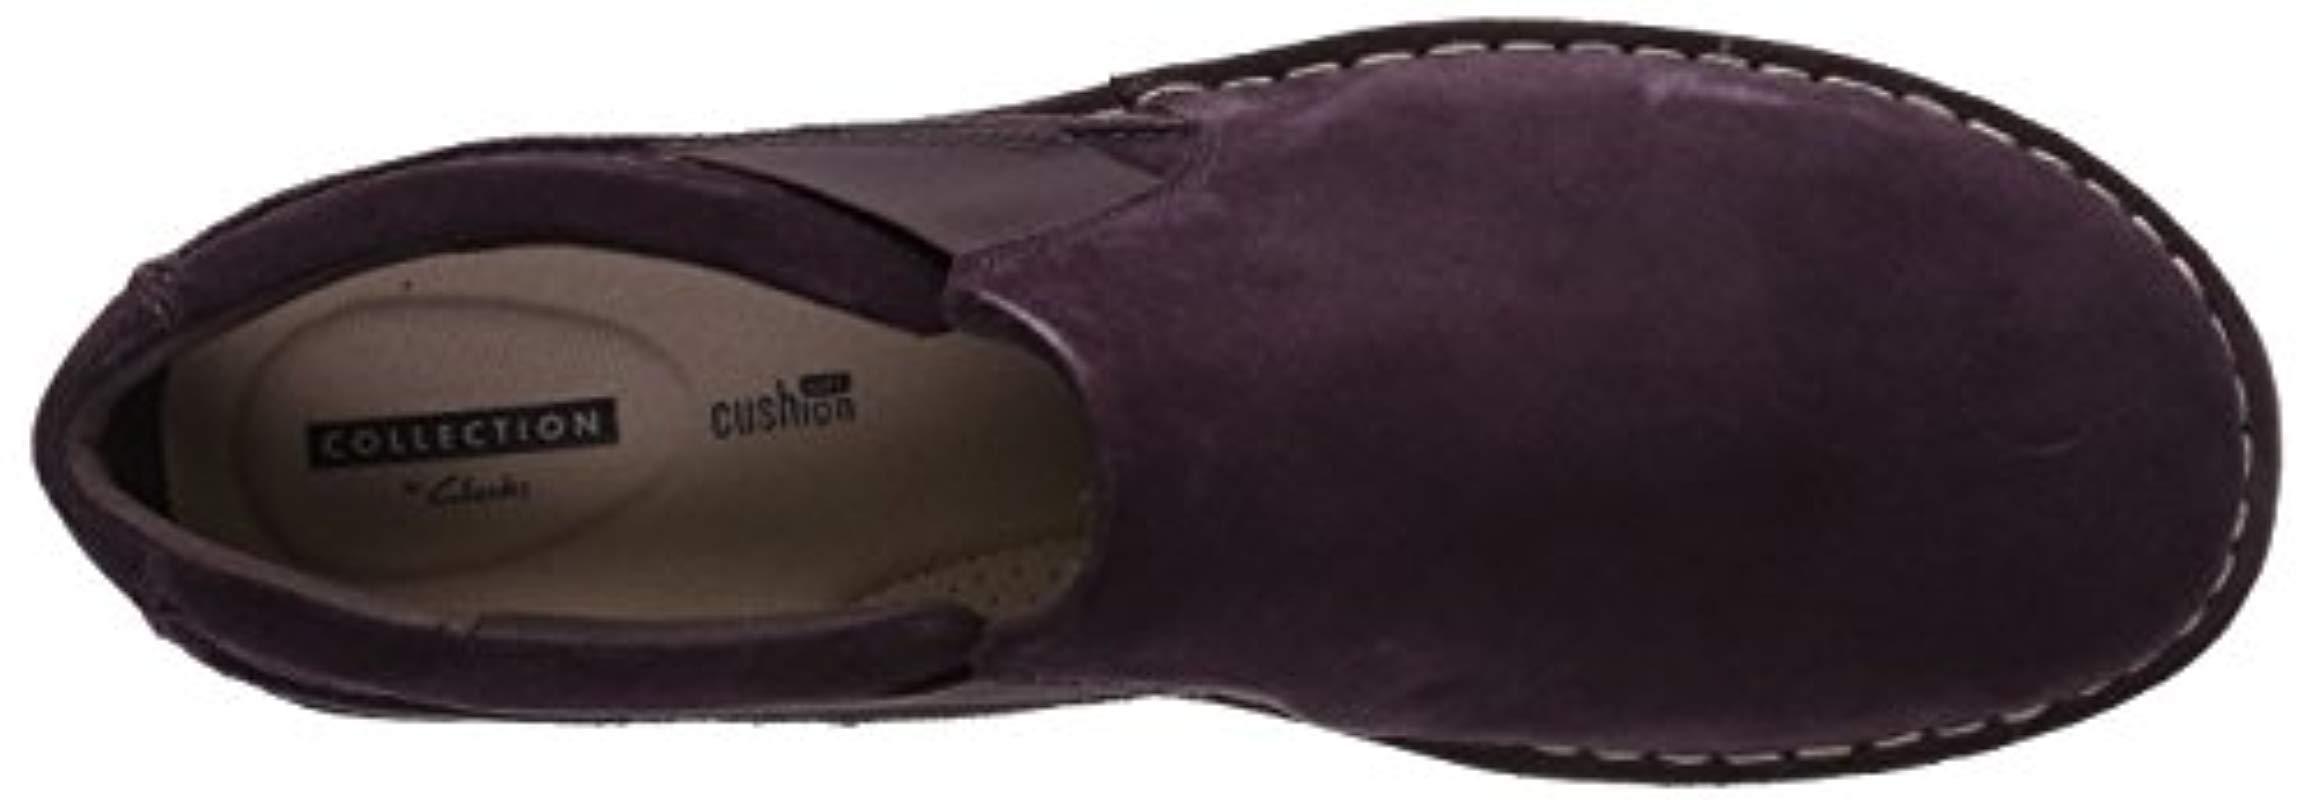 e9708e1a2e6 Clarks - Purple Tamitha Gwyn Loafer - Lyst. View fullscreen